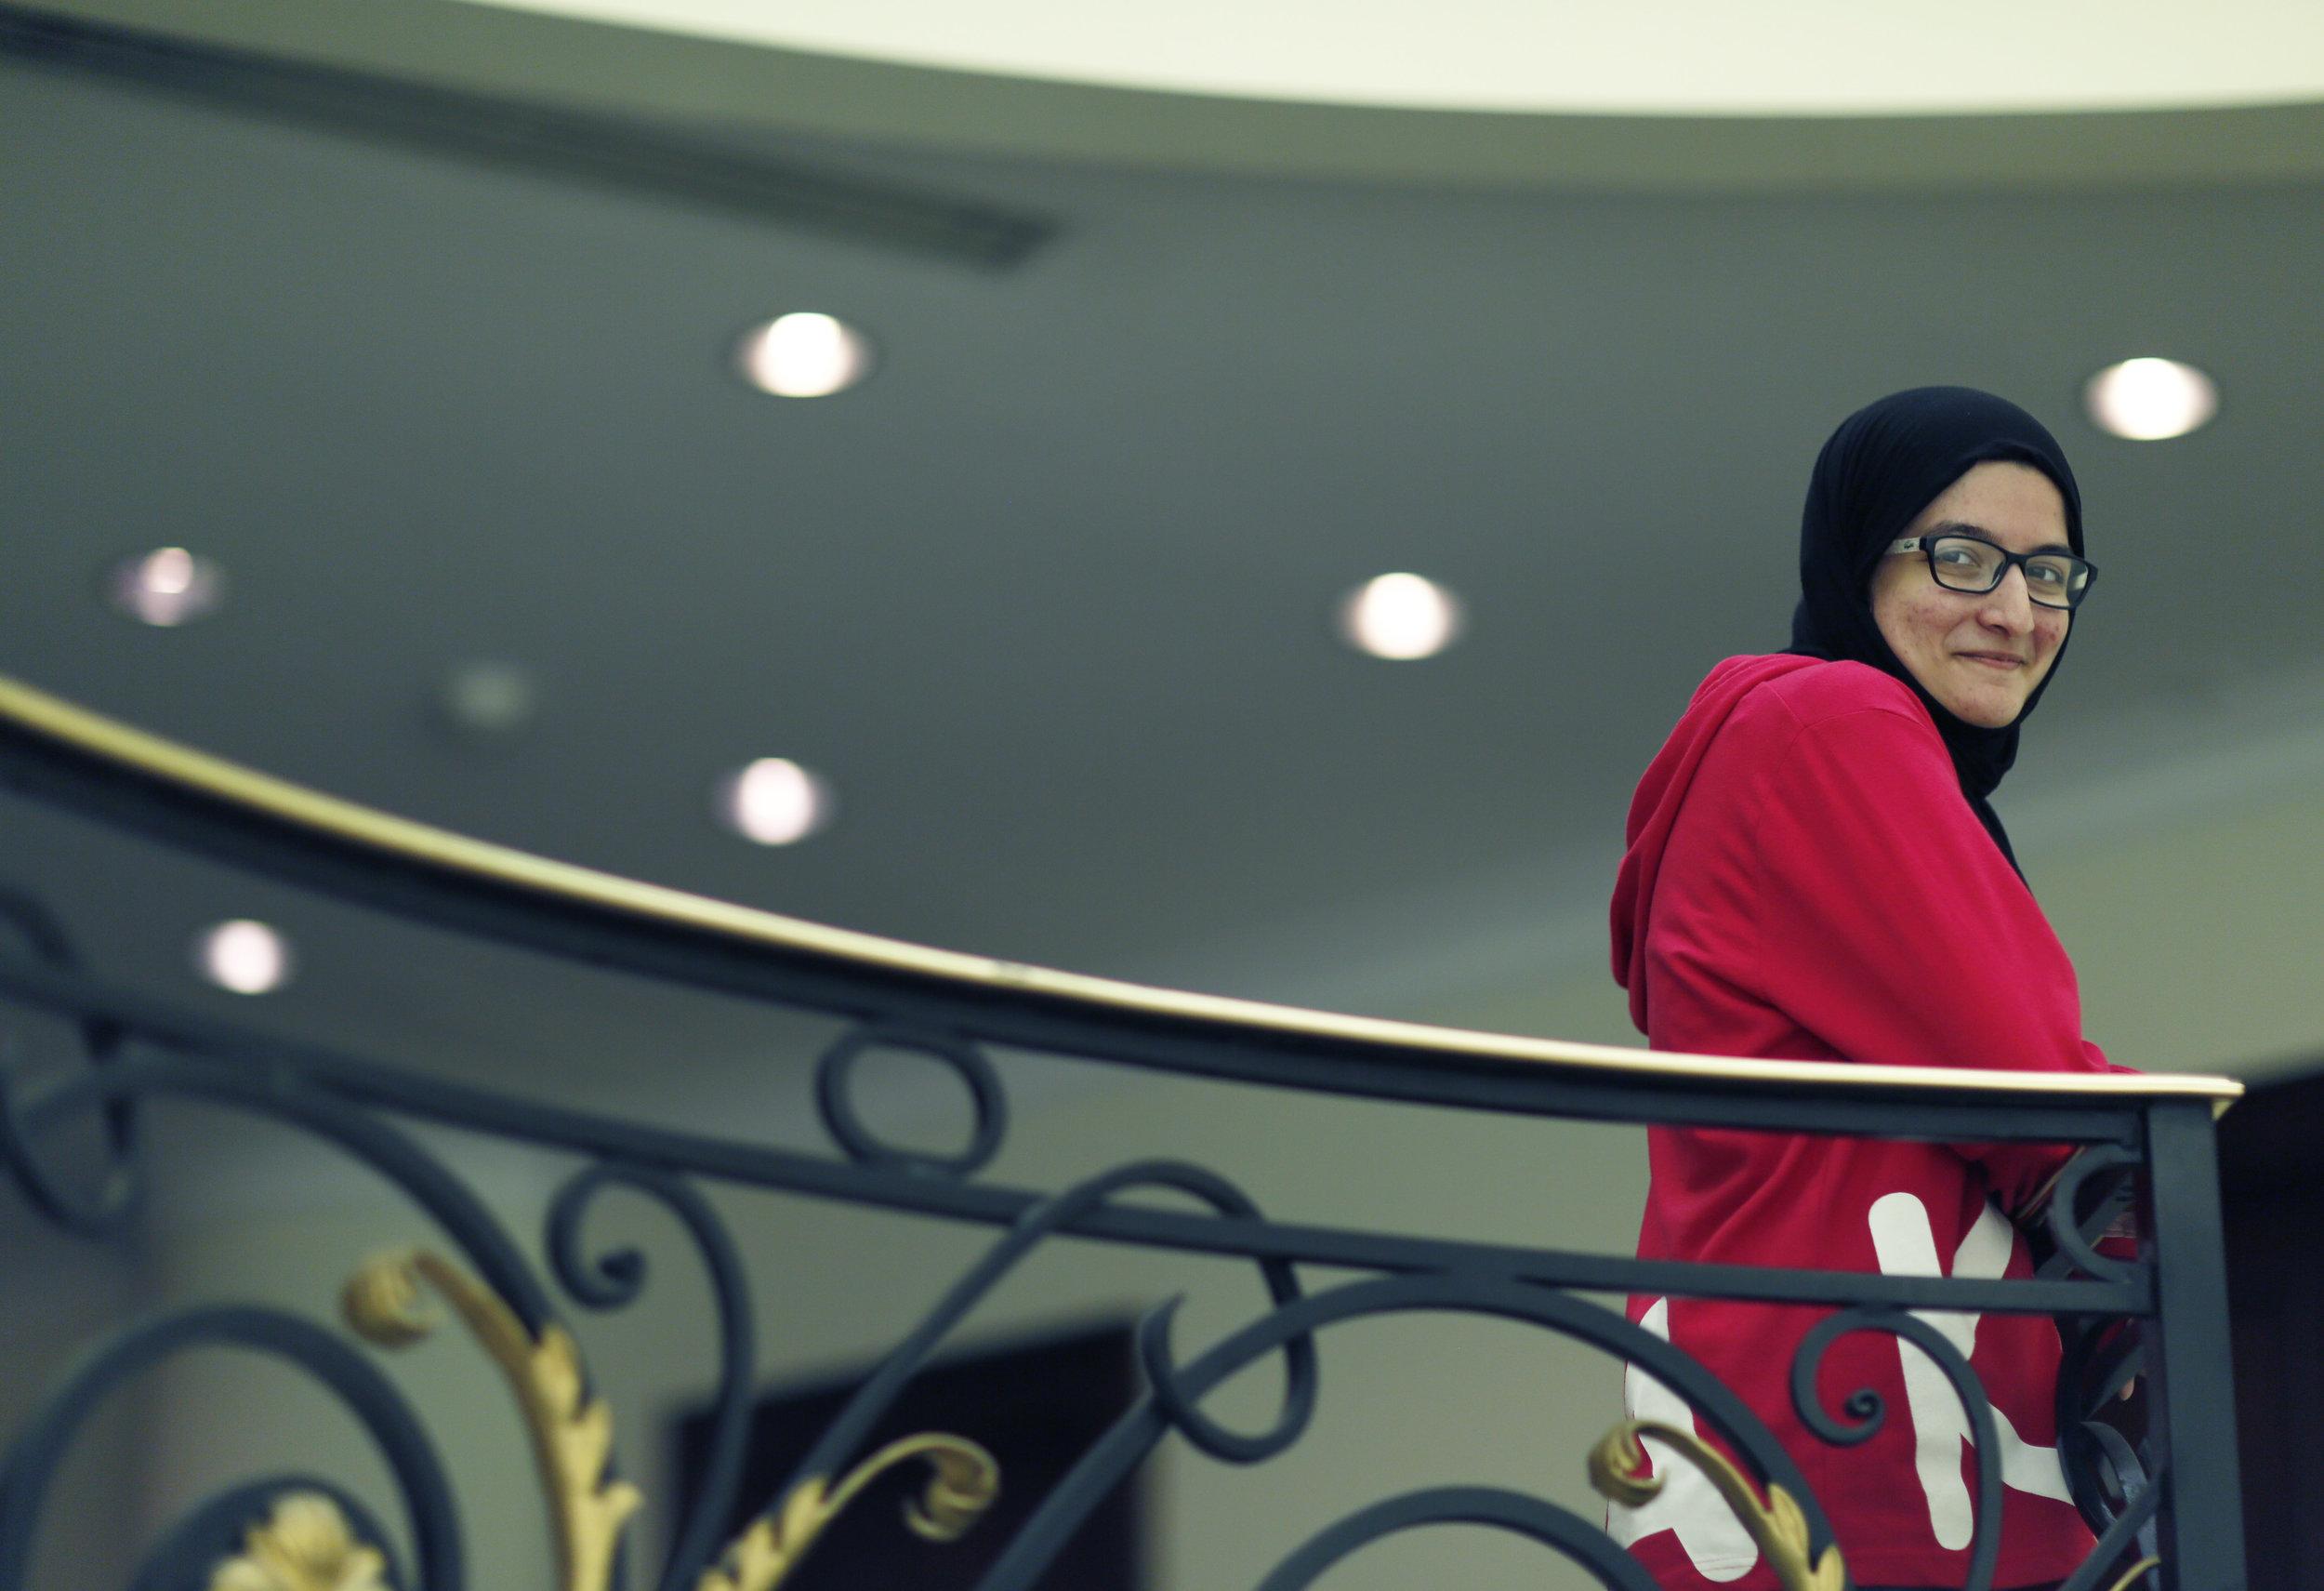 Student, Chemical Engineering, Manama, Bahrain — WOW Woman